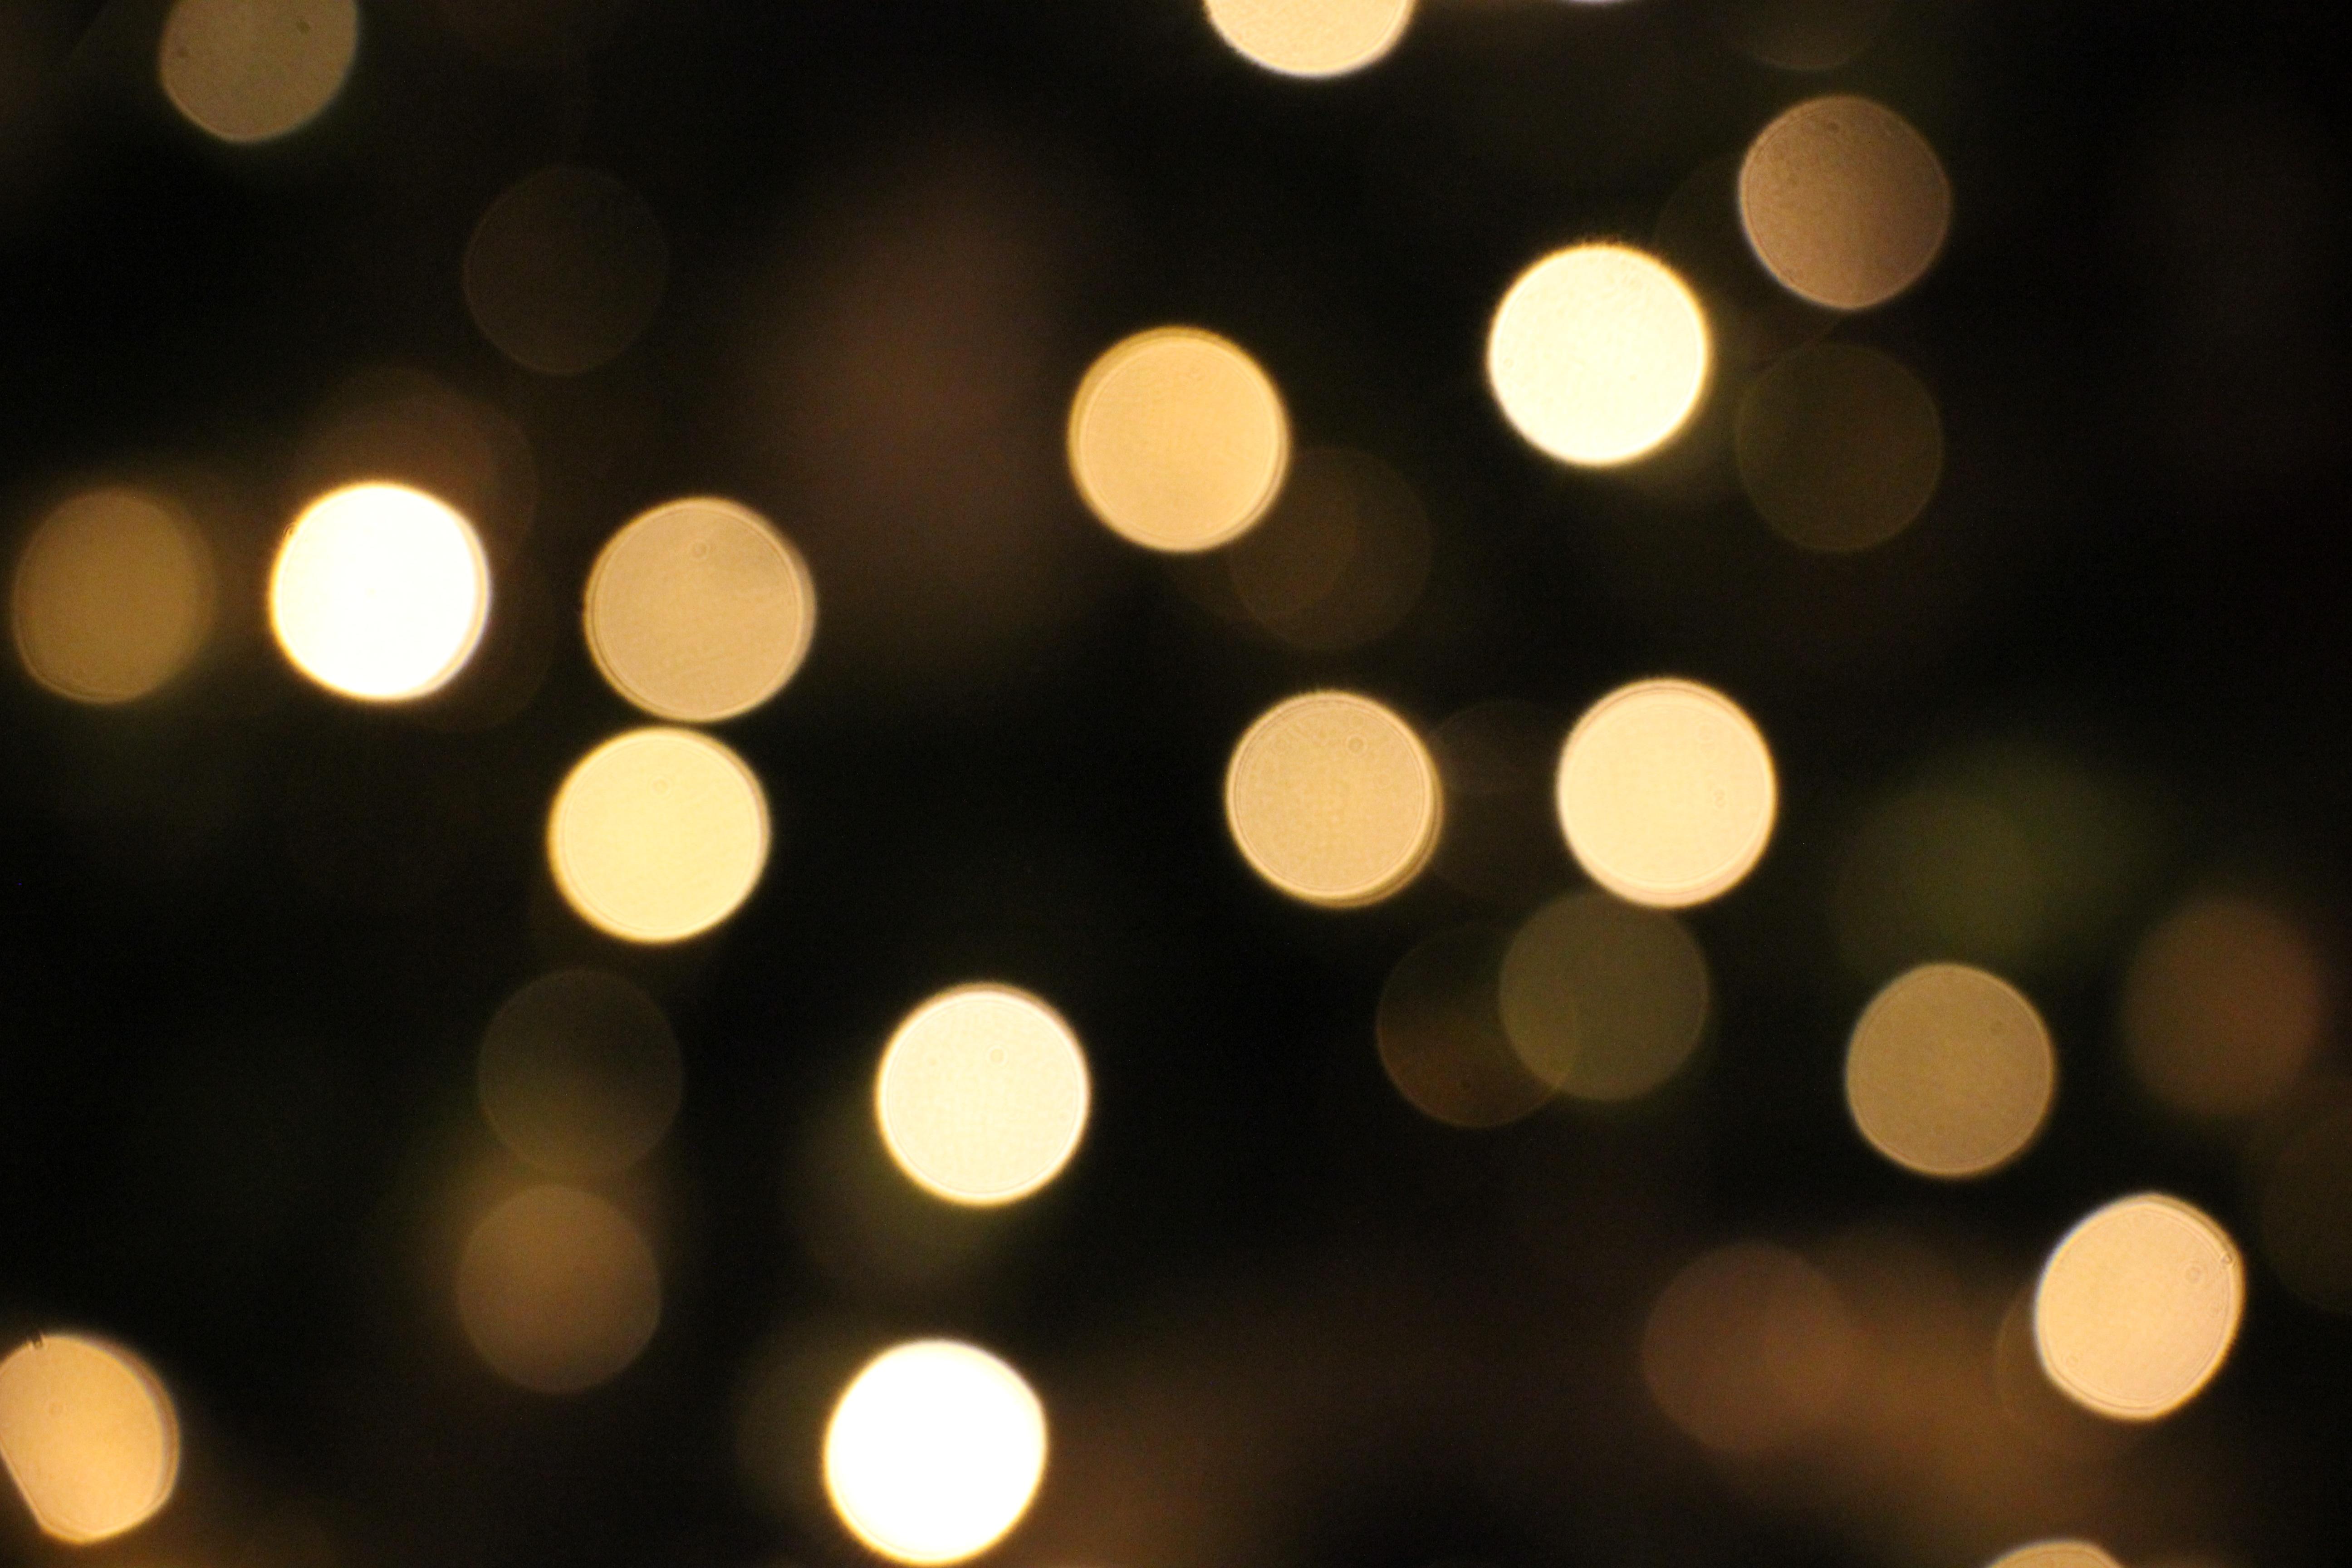 Free Images Night Darkness Christmas Lighting Circle